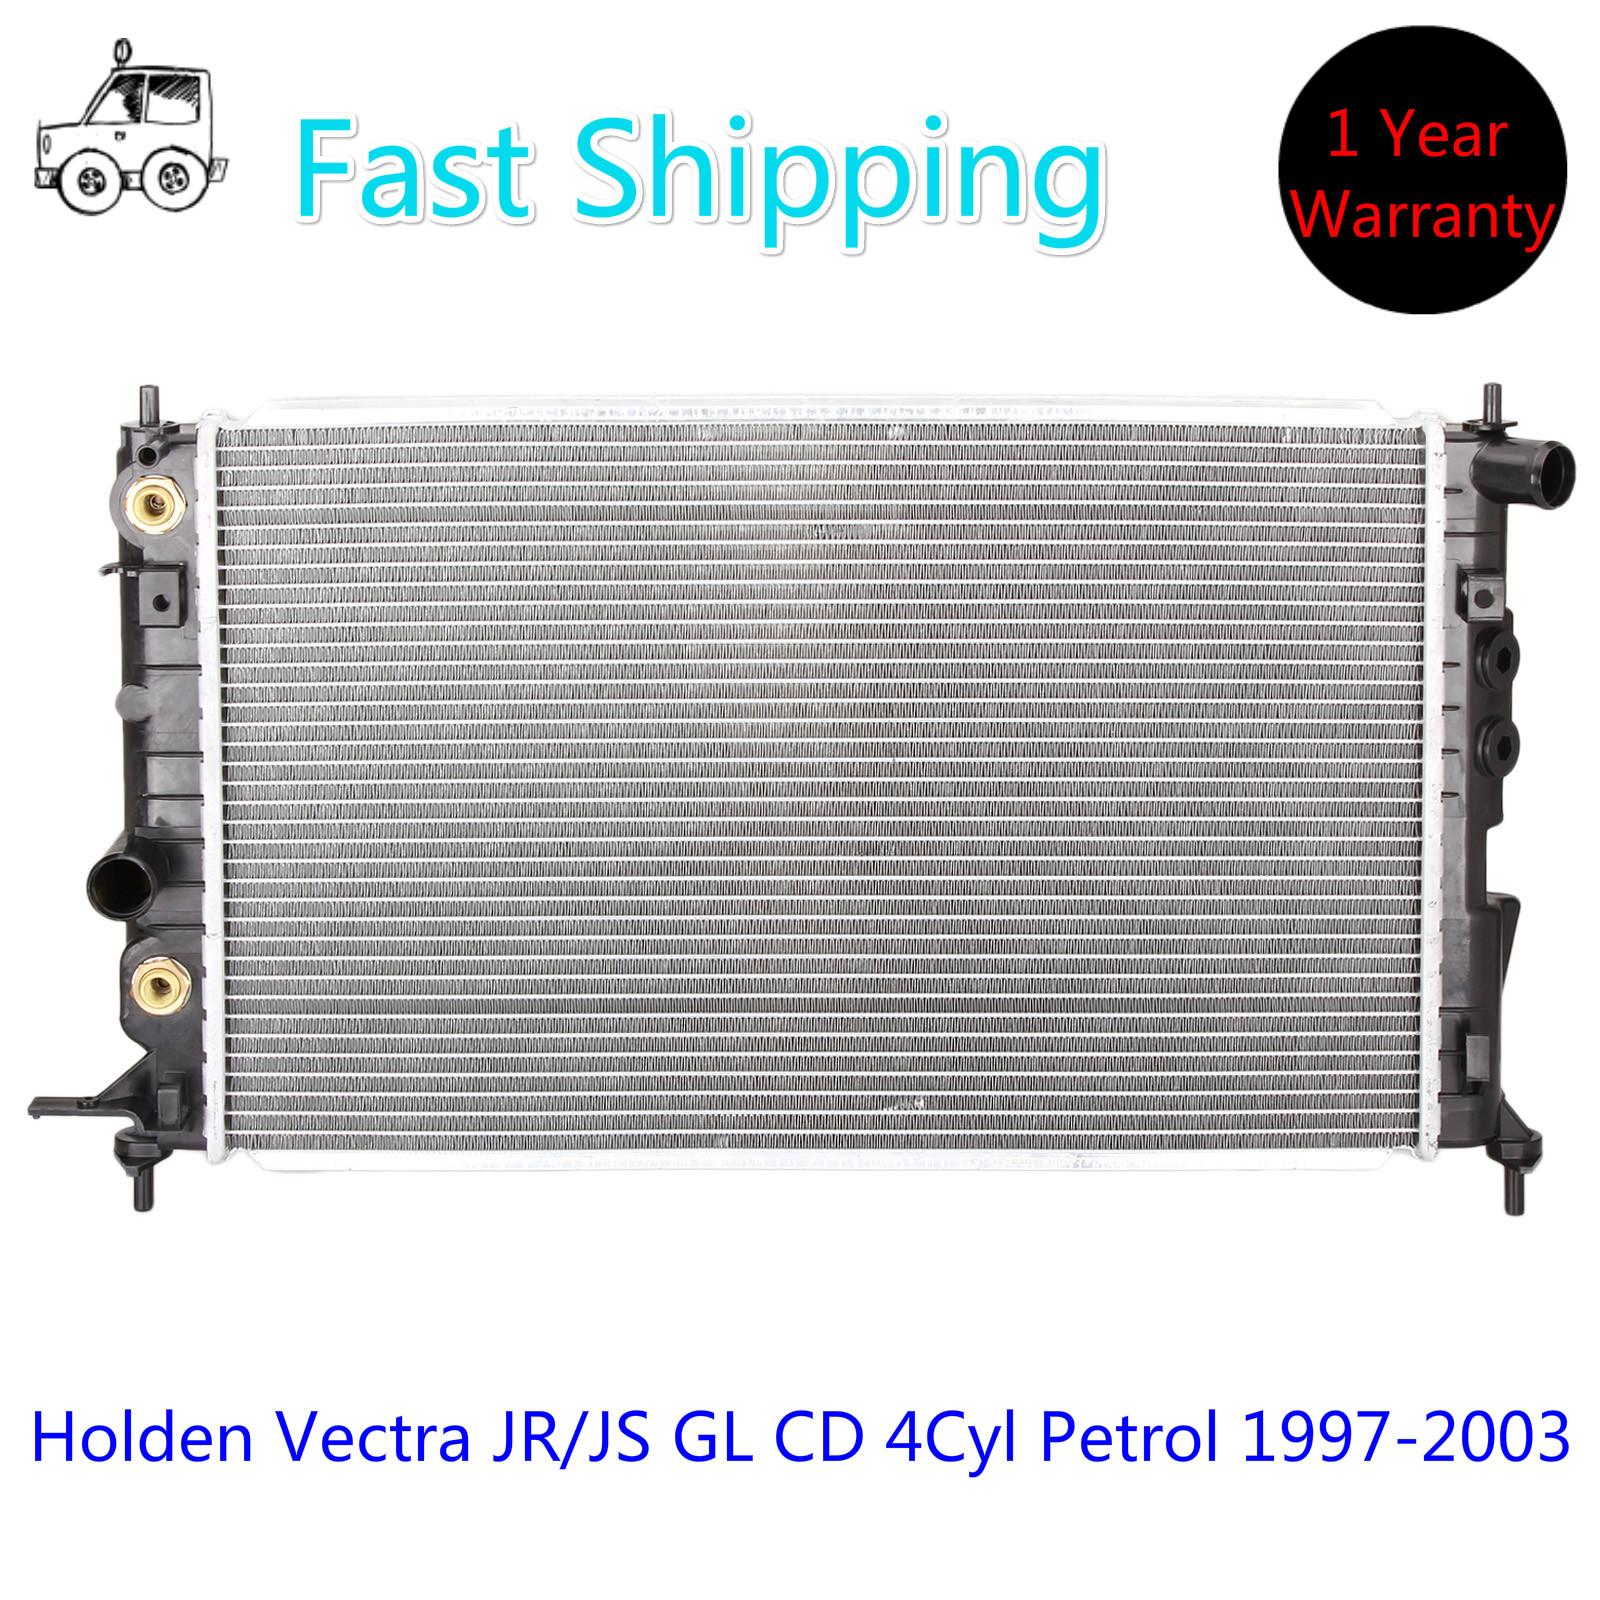 Holden Premium Radiator for Vectra JR/JS GL CD 4Cyl Petrol 1997-2003 Auto/ Manual